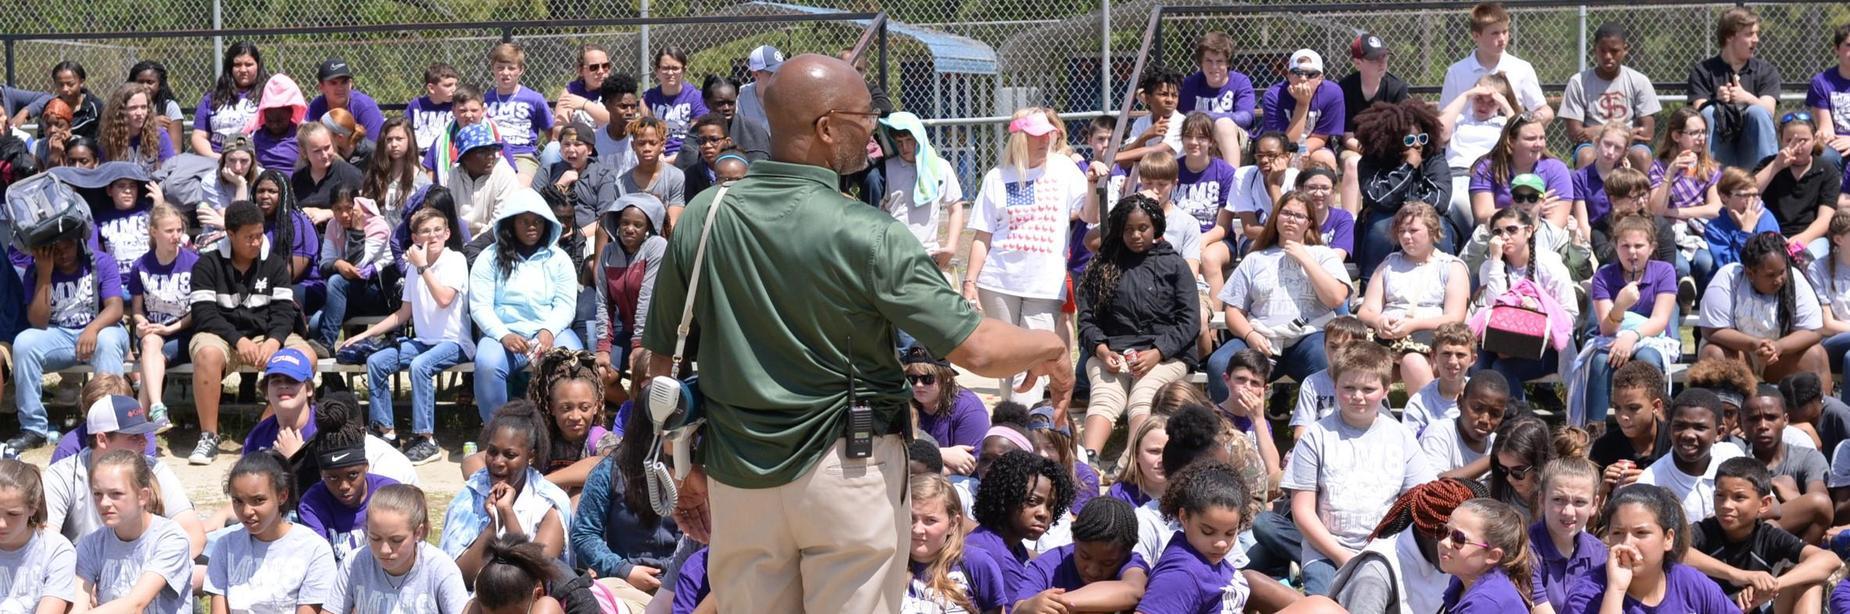 Mr. Ellis addressing mms students